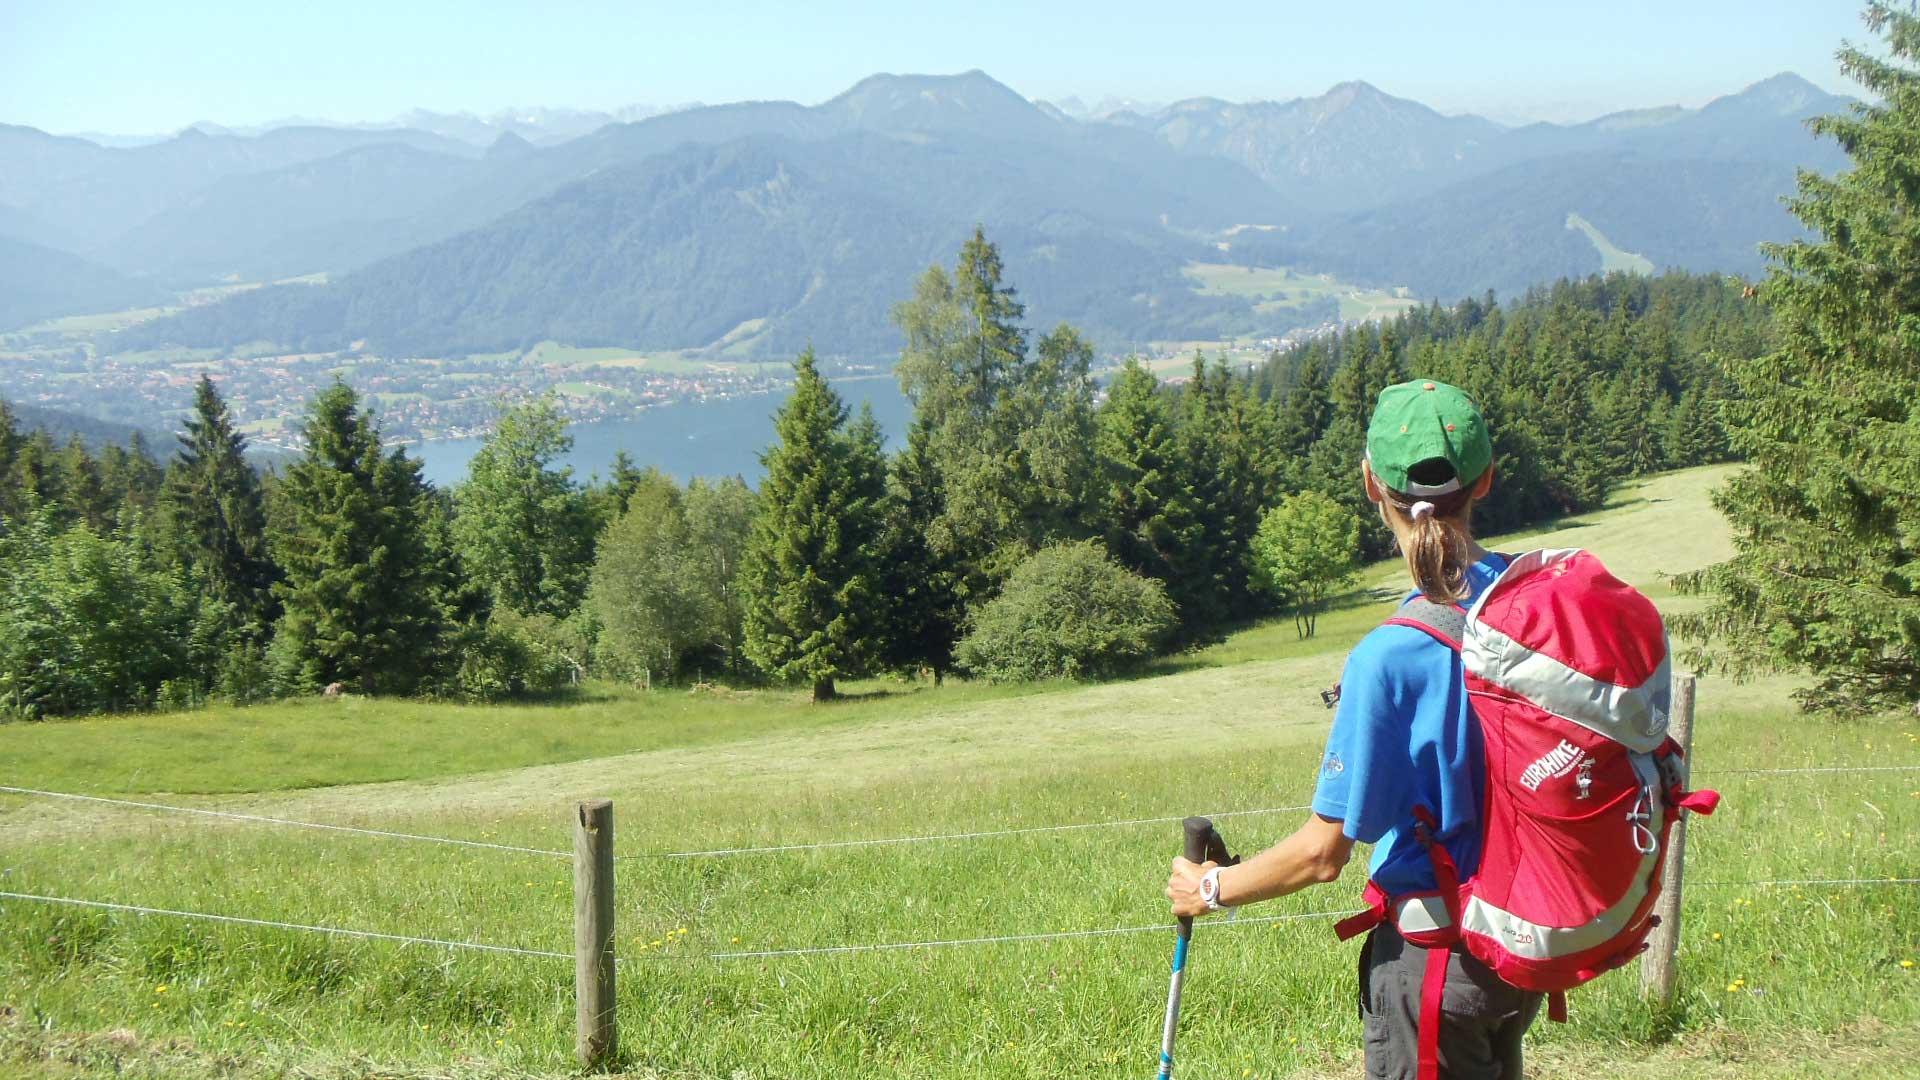 Bayerische-Alpen_Seeblick_Wanderer